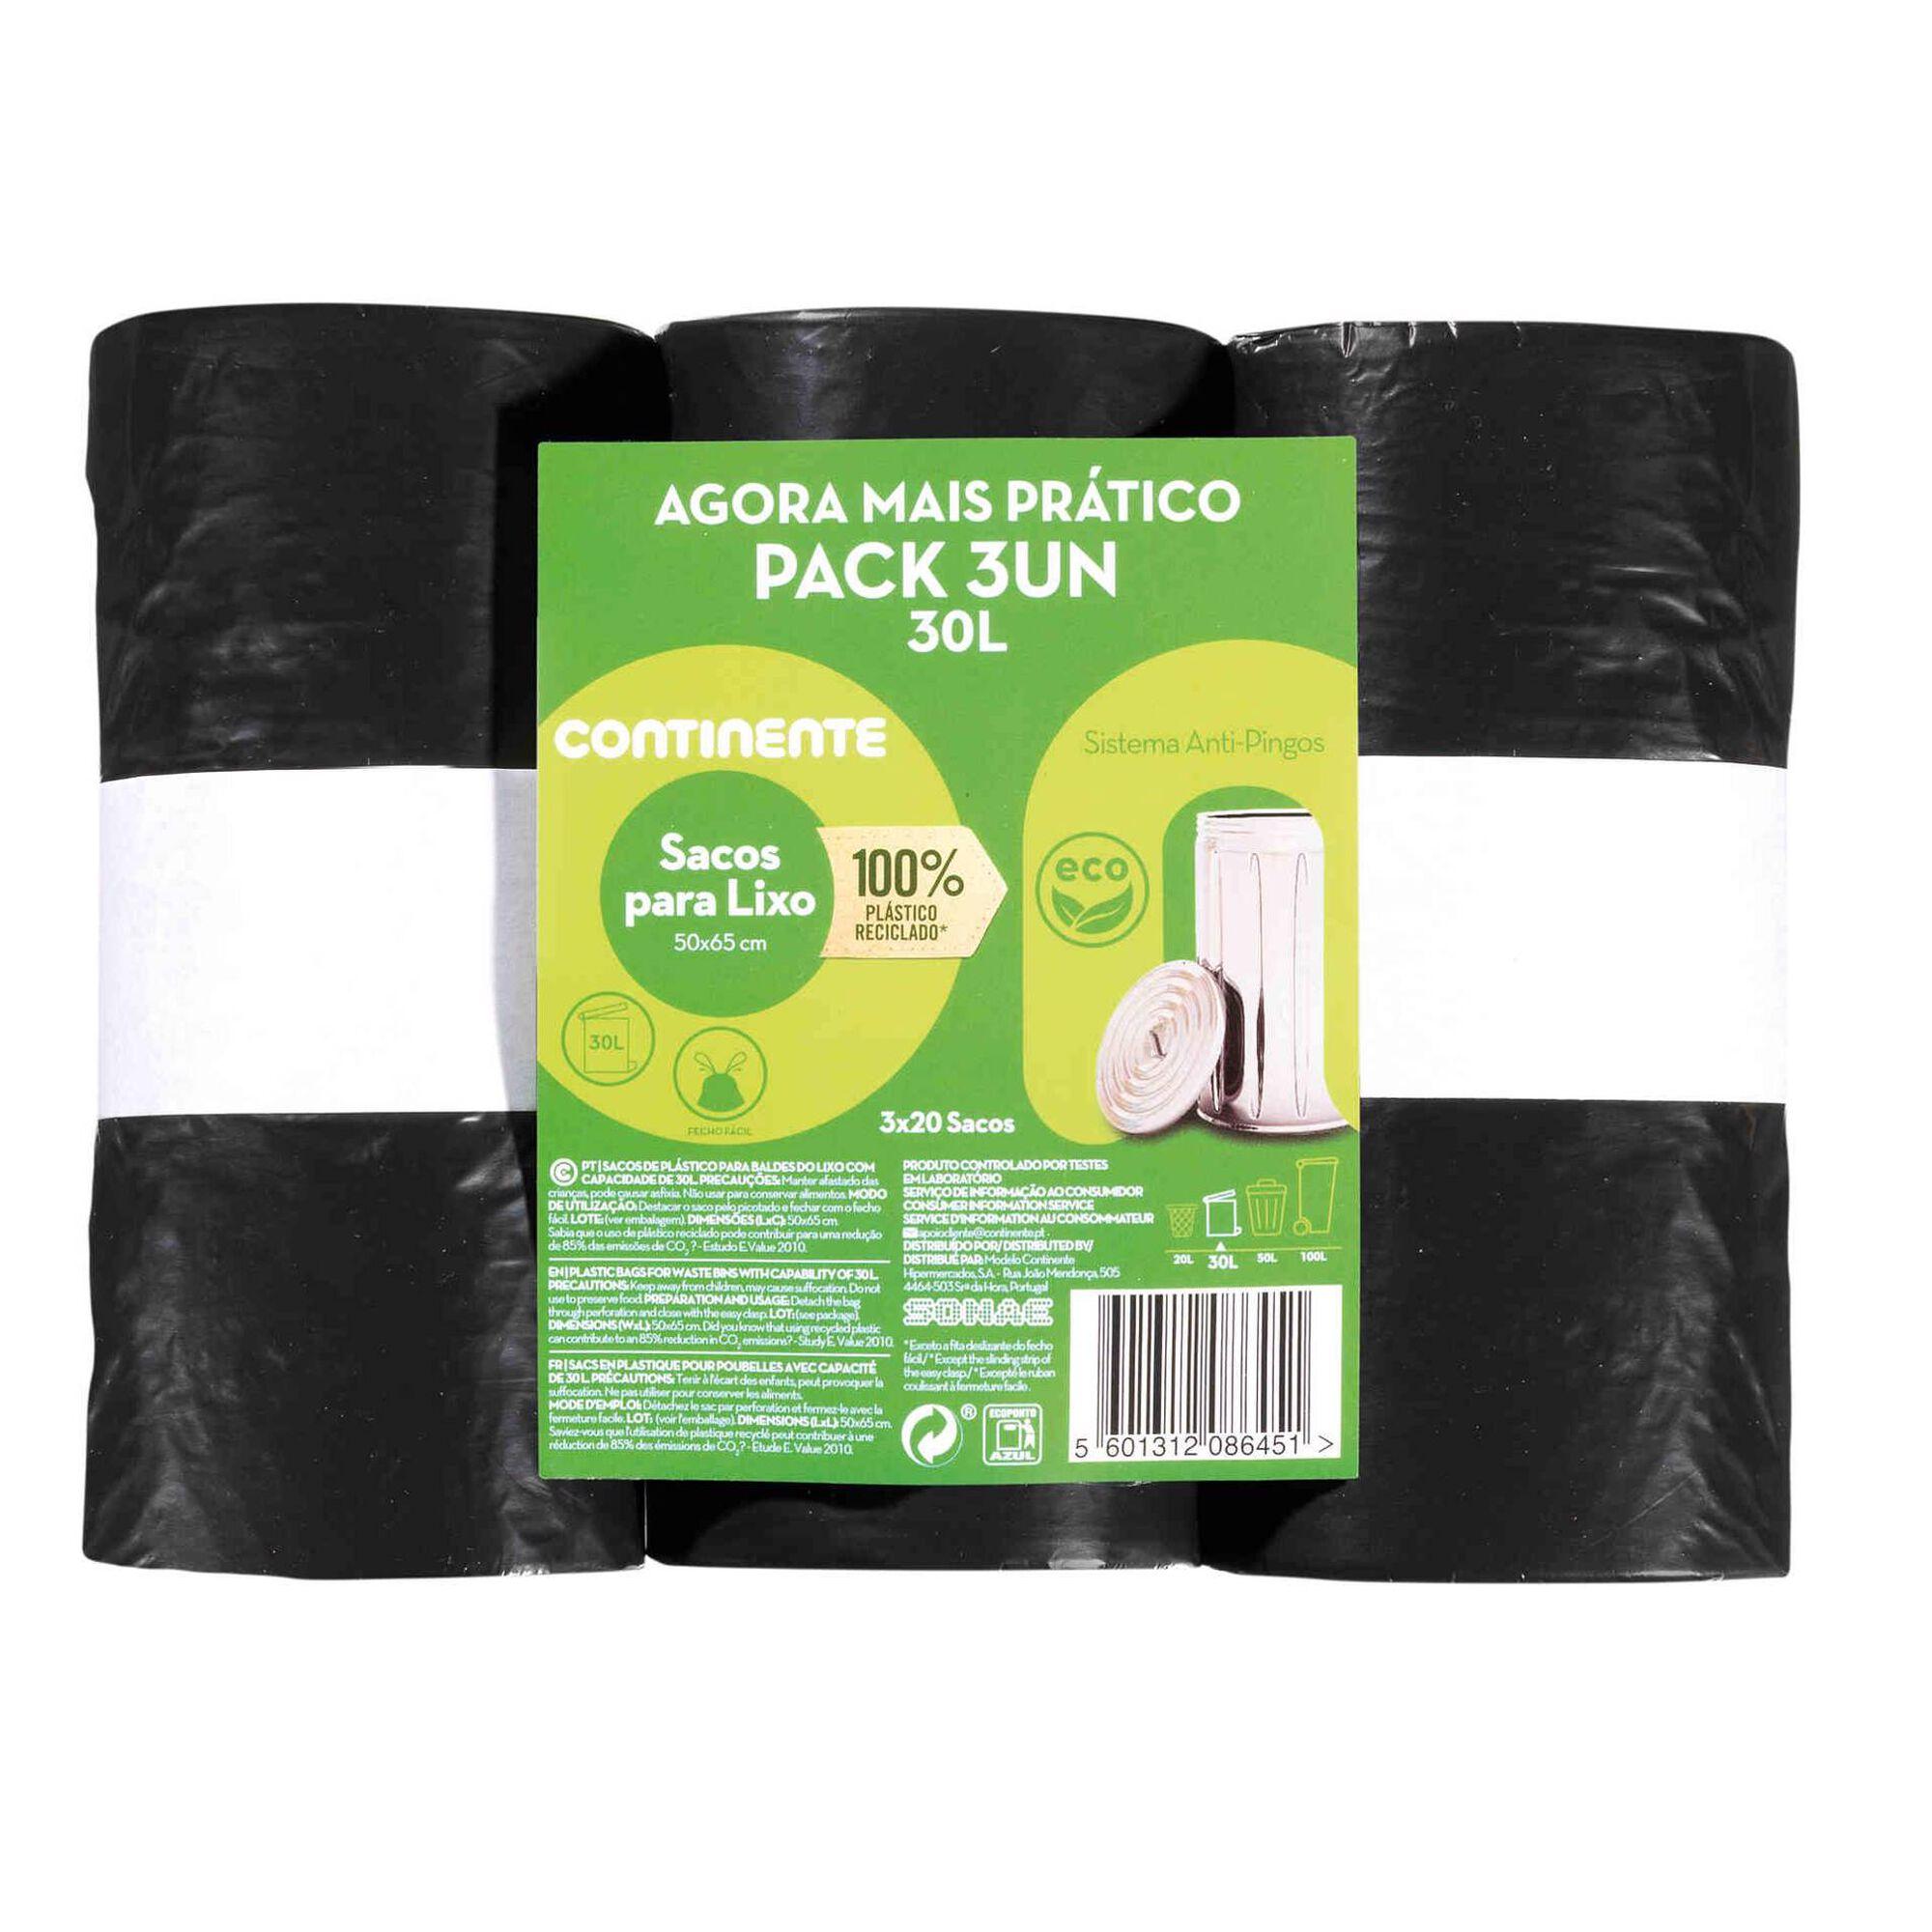 Sacos Lixo 100% Reciclado 30 lt